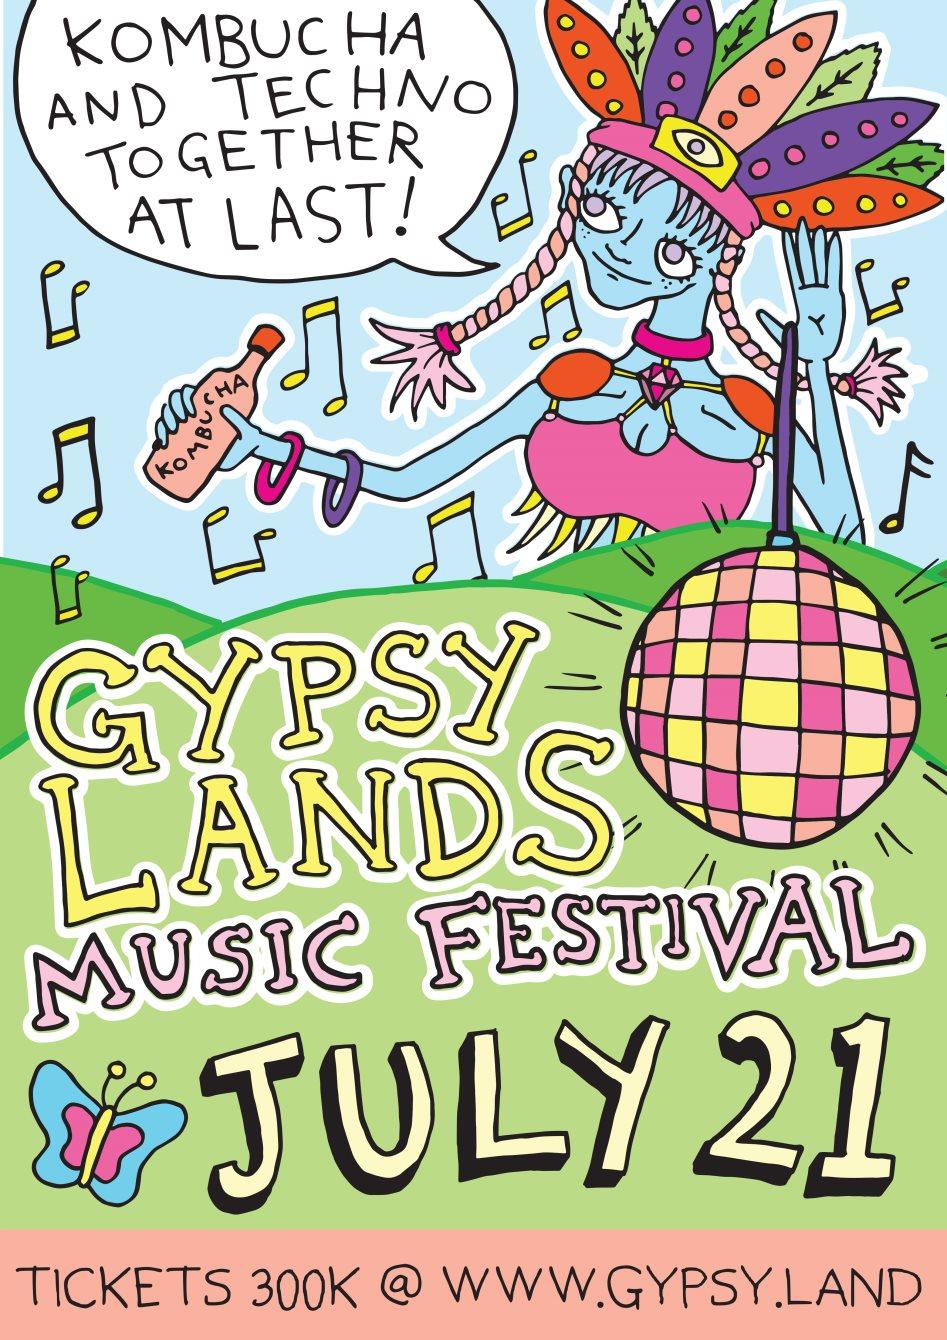 GypsyLands_pic1.jpg